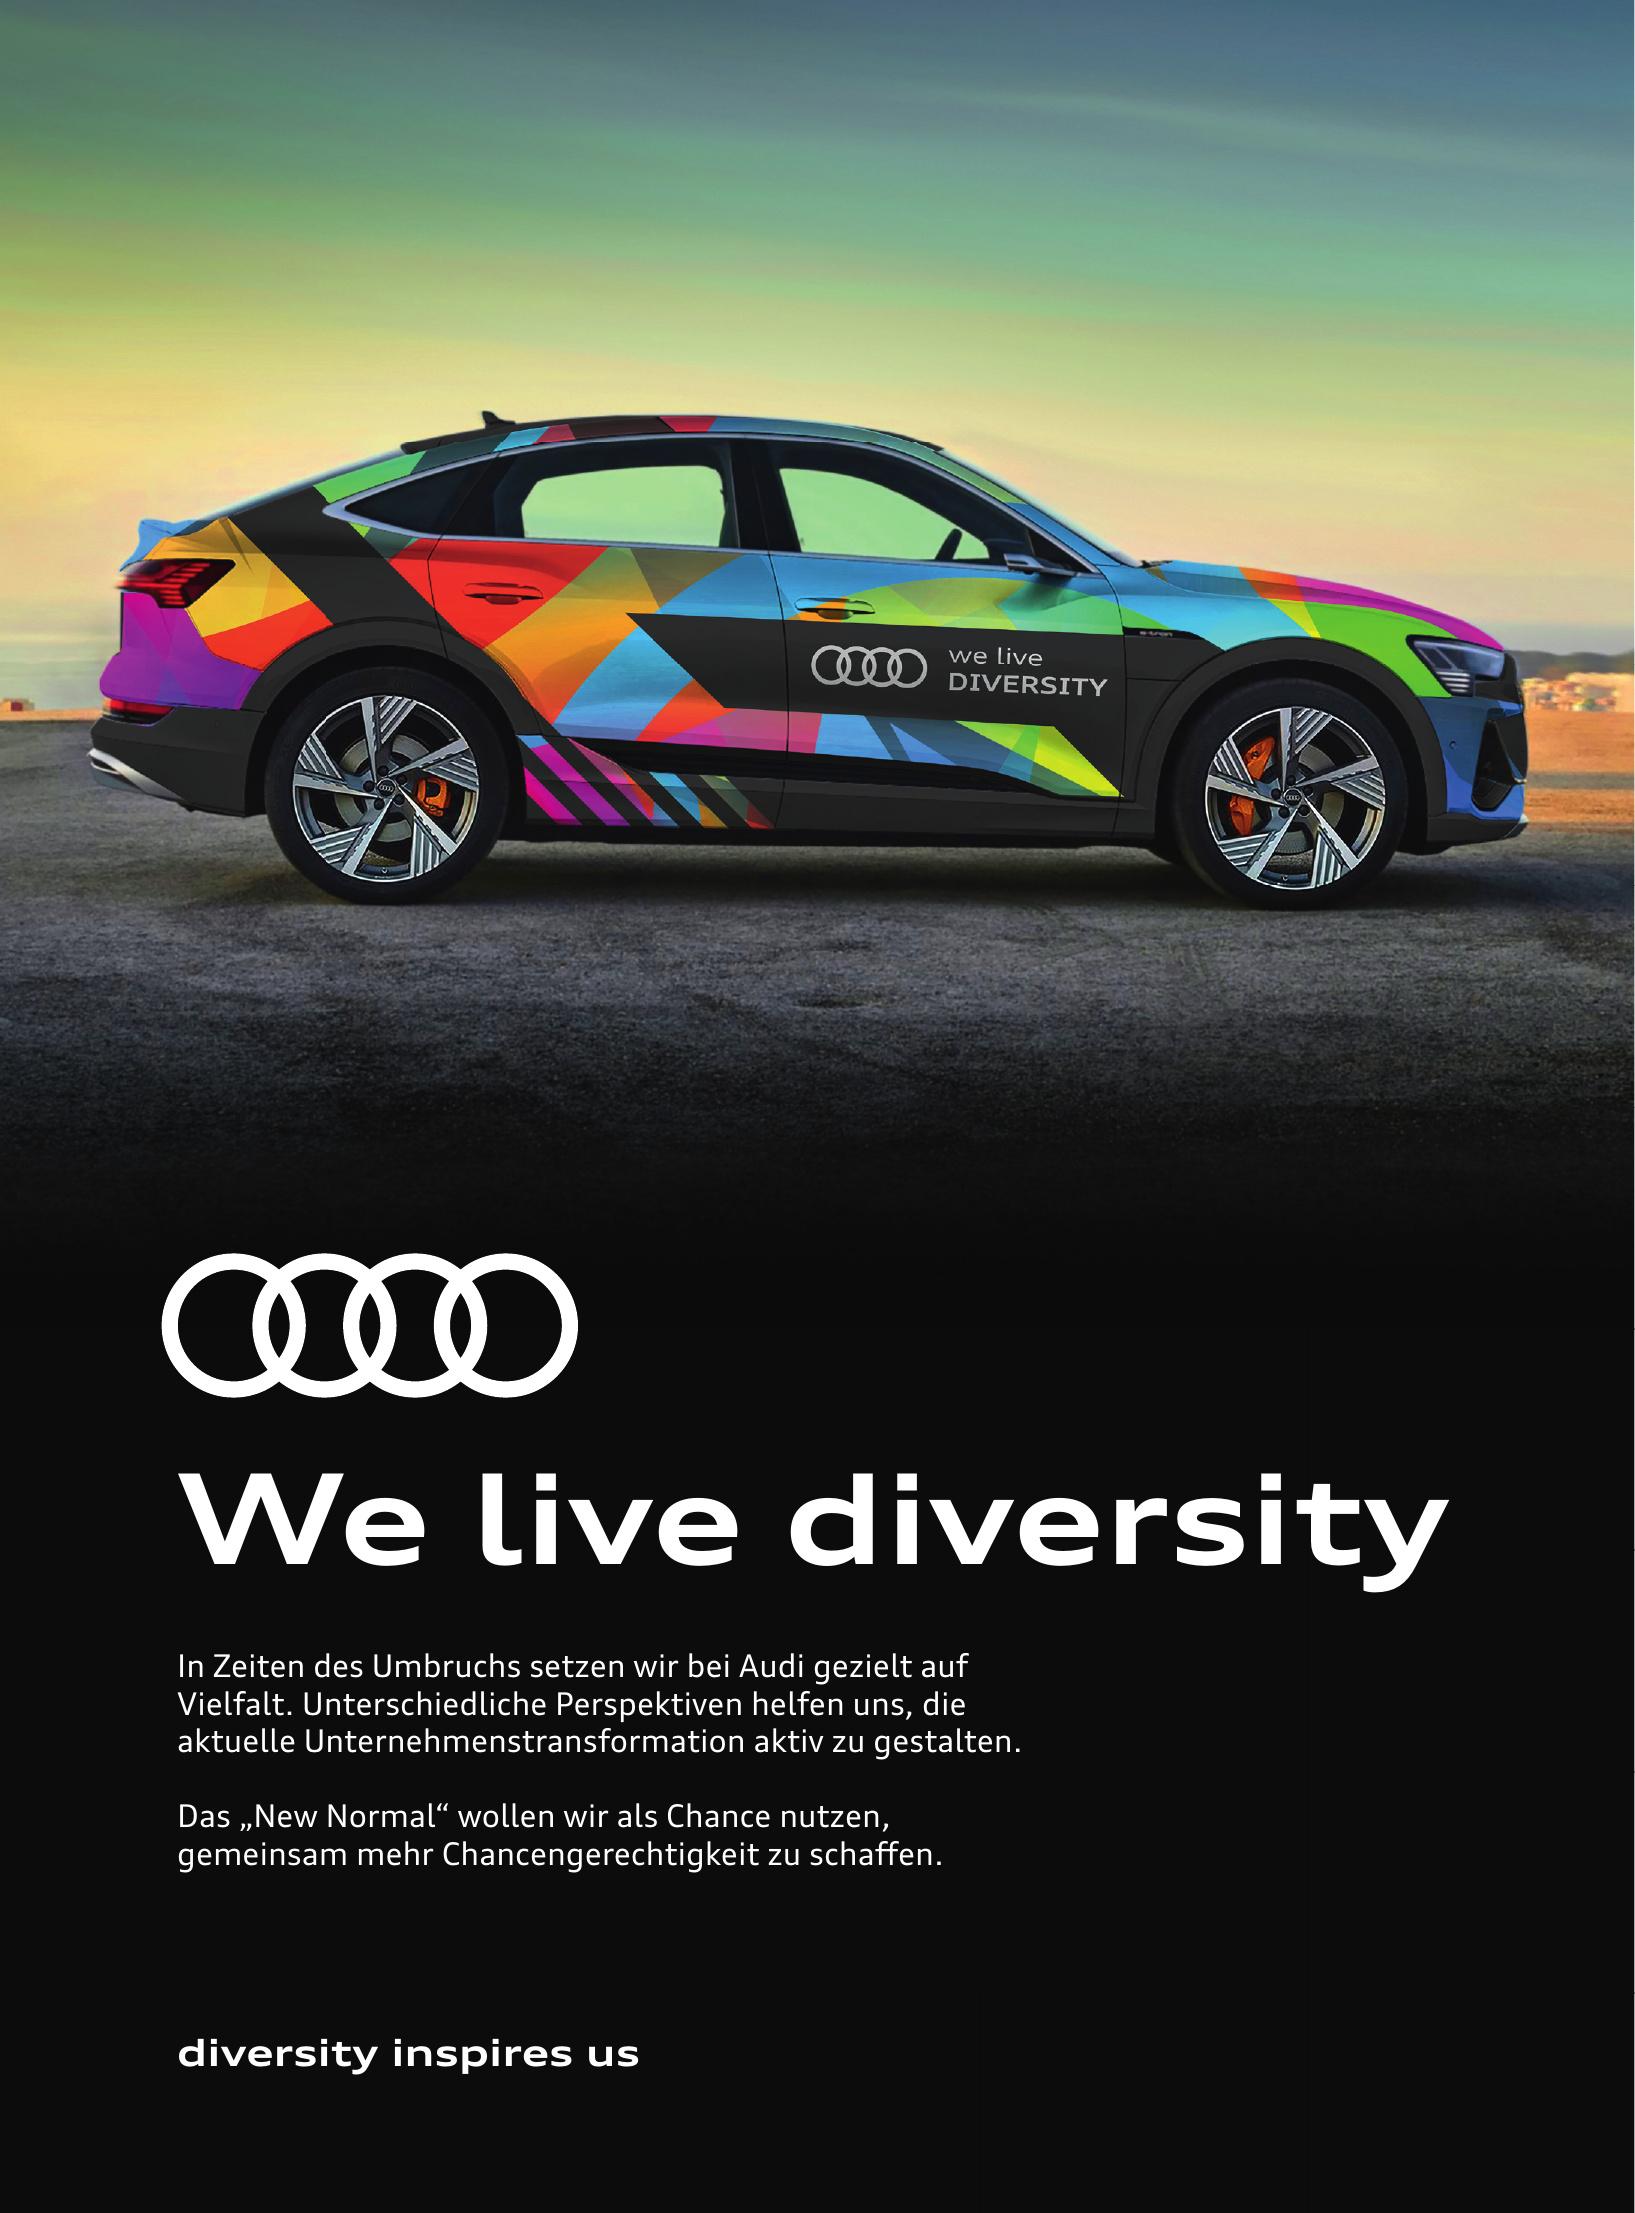 Audi - We live diversity